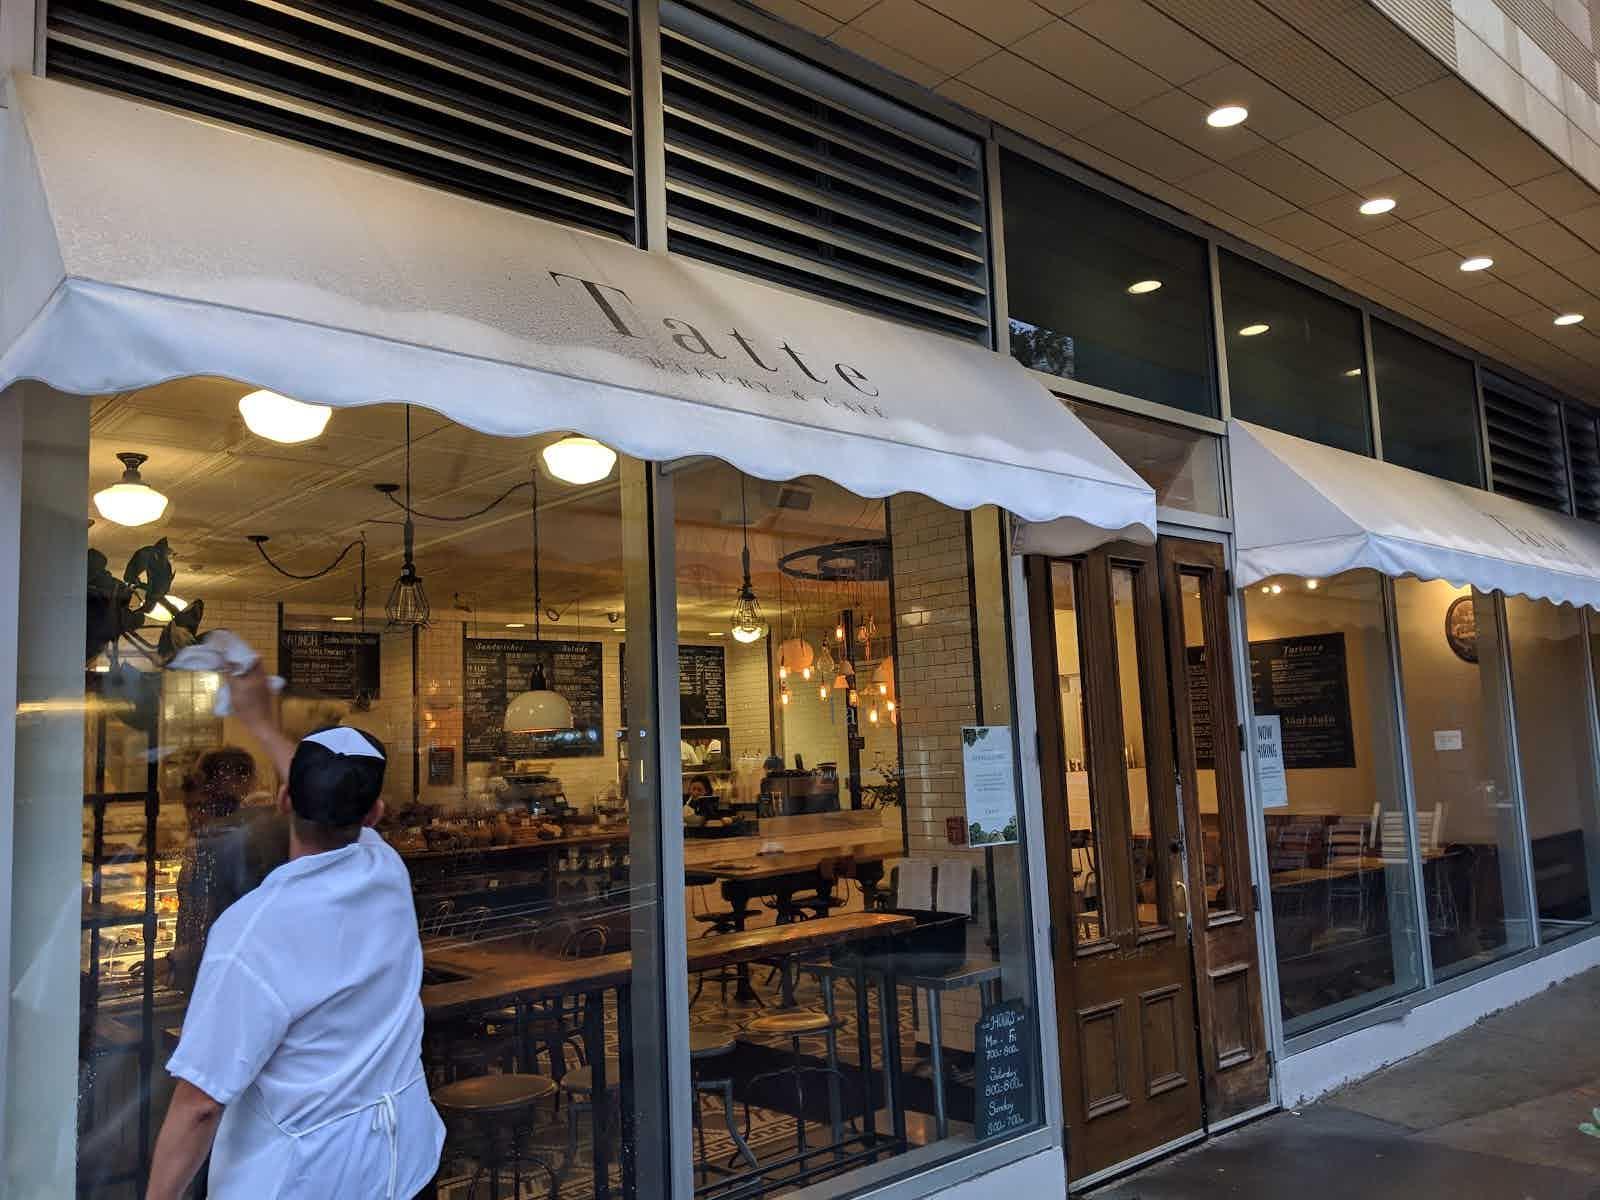 Tatte Bakery & Cafe - Cambridge | Restaurant Review - Zagat